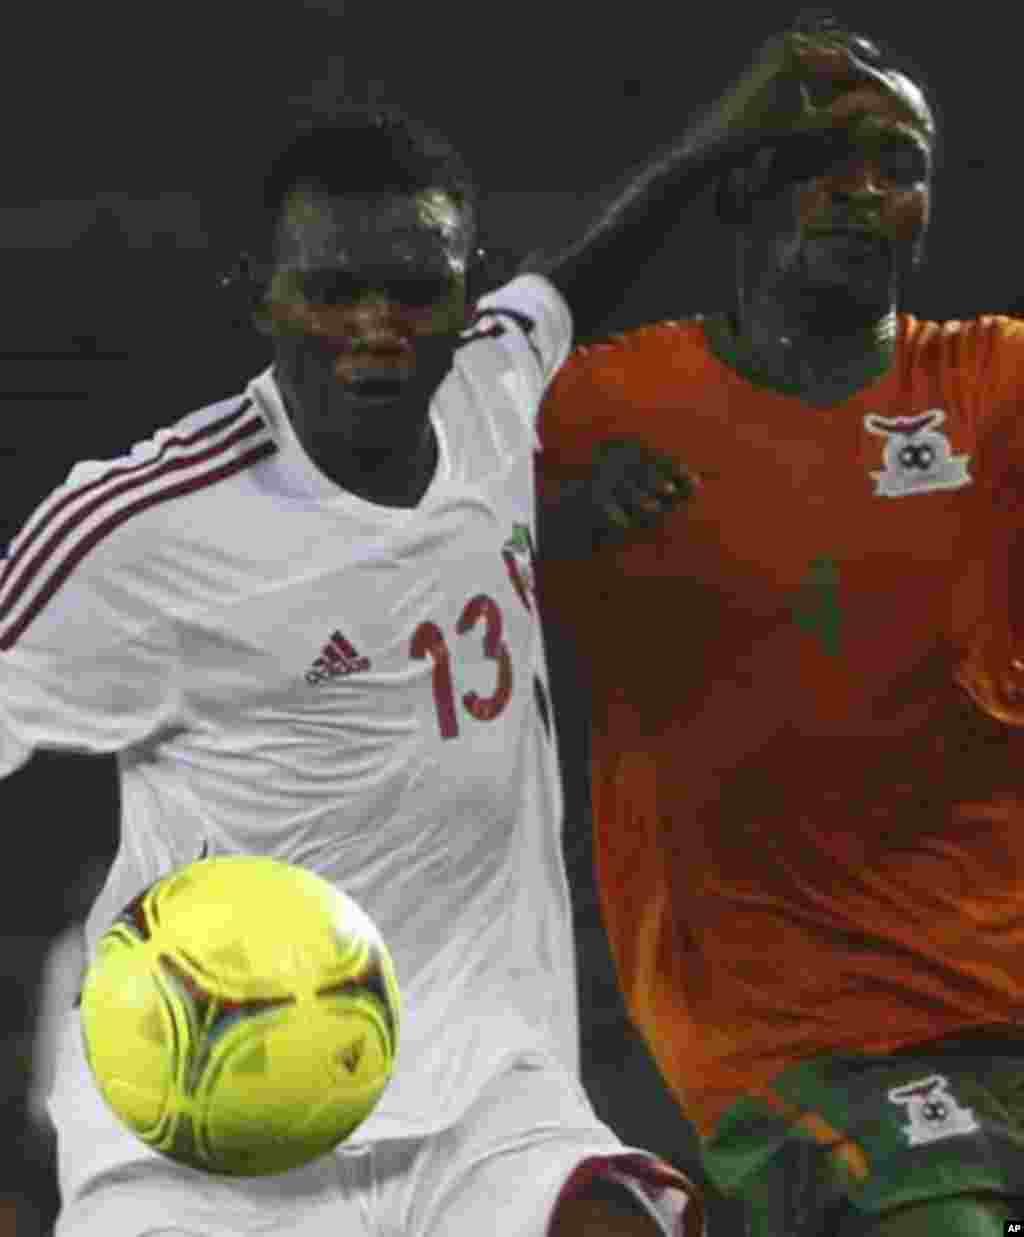 "Joseph Musonda of Zambia (R) fights for the ball with Amer Kamal of Sudan during their African Nations Cup quarter-final soccer match at Estadio de Bata ""Bata Stadium"", in Bata February 4, 2012."